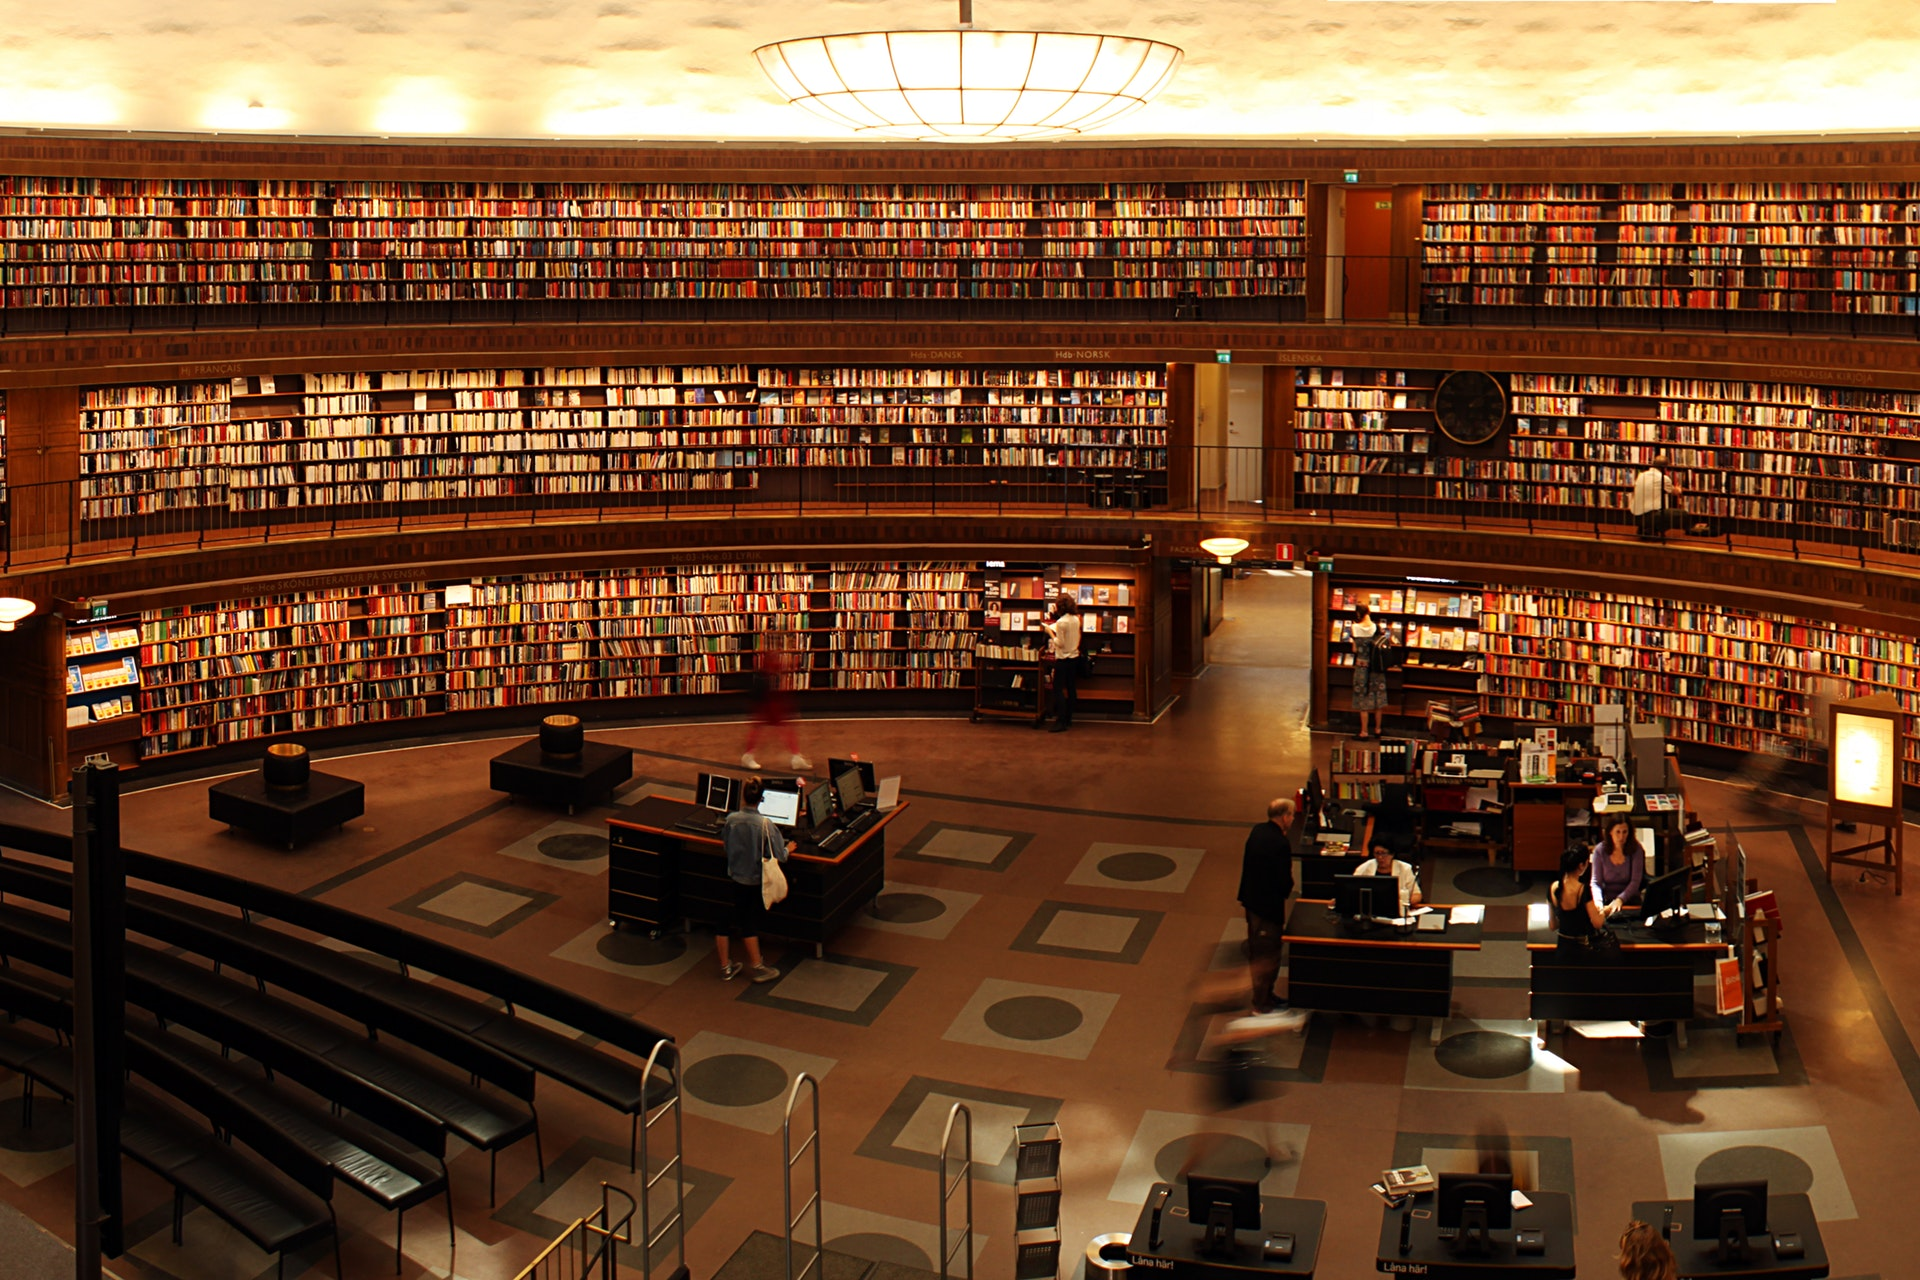 University Library Commonwealth Room